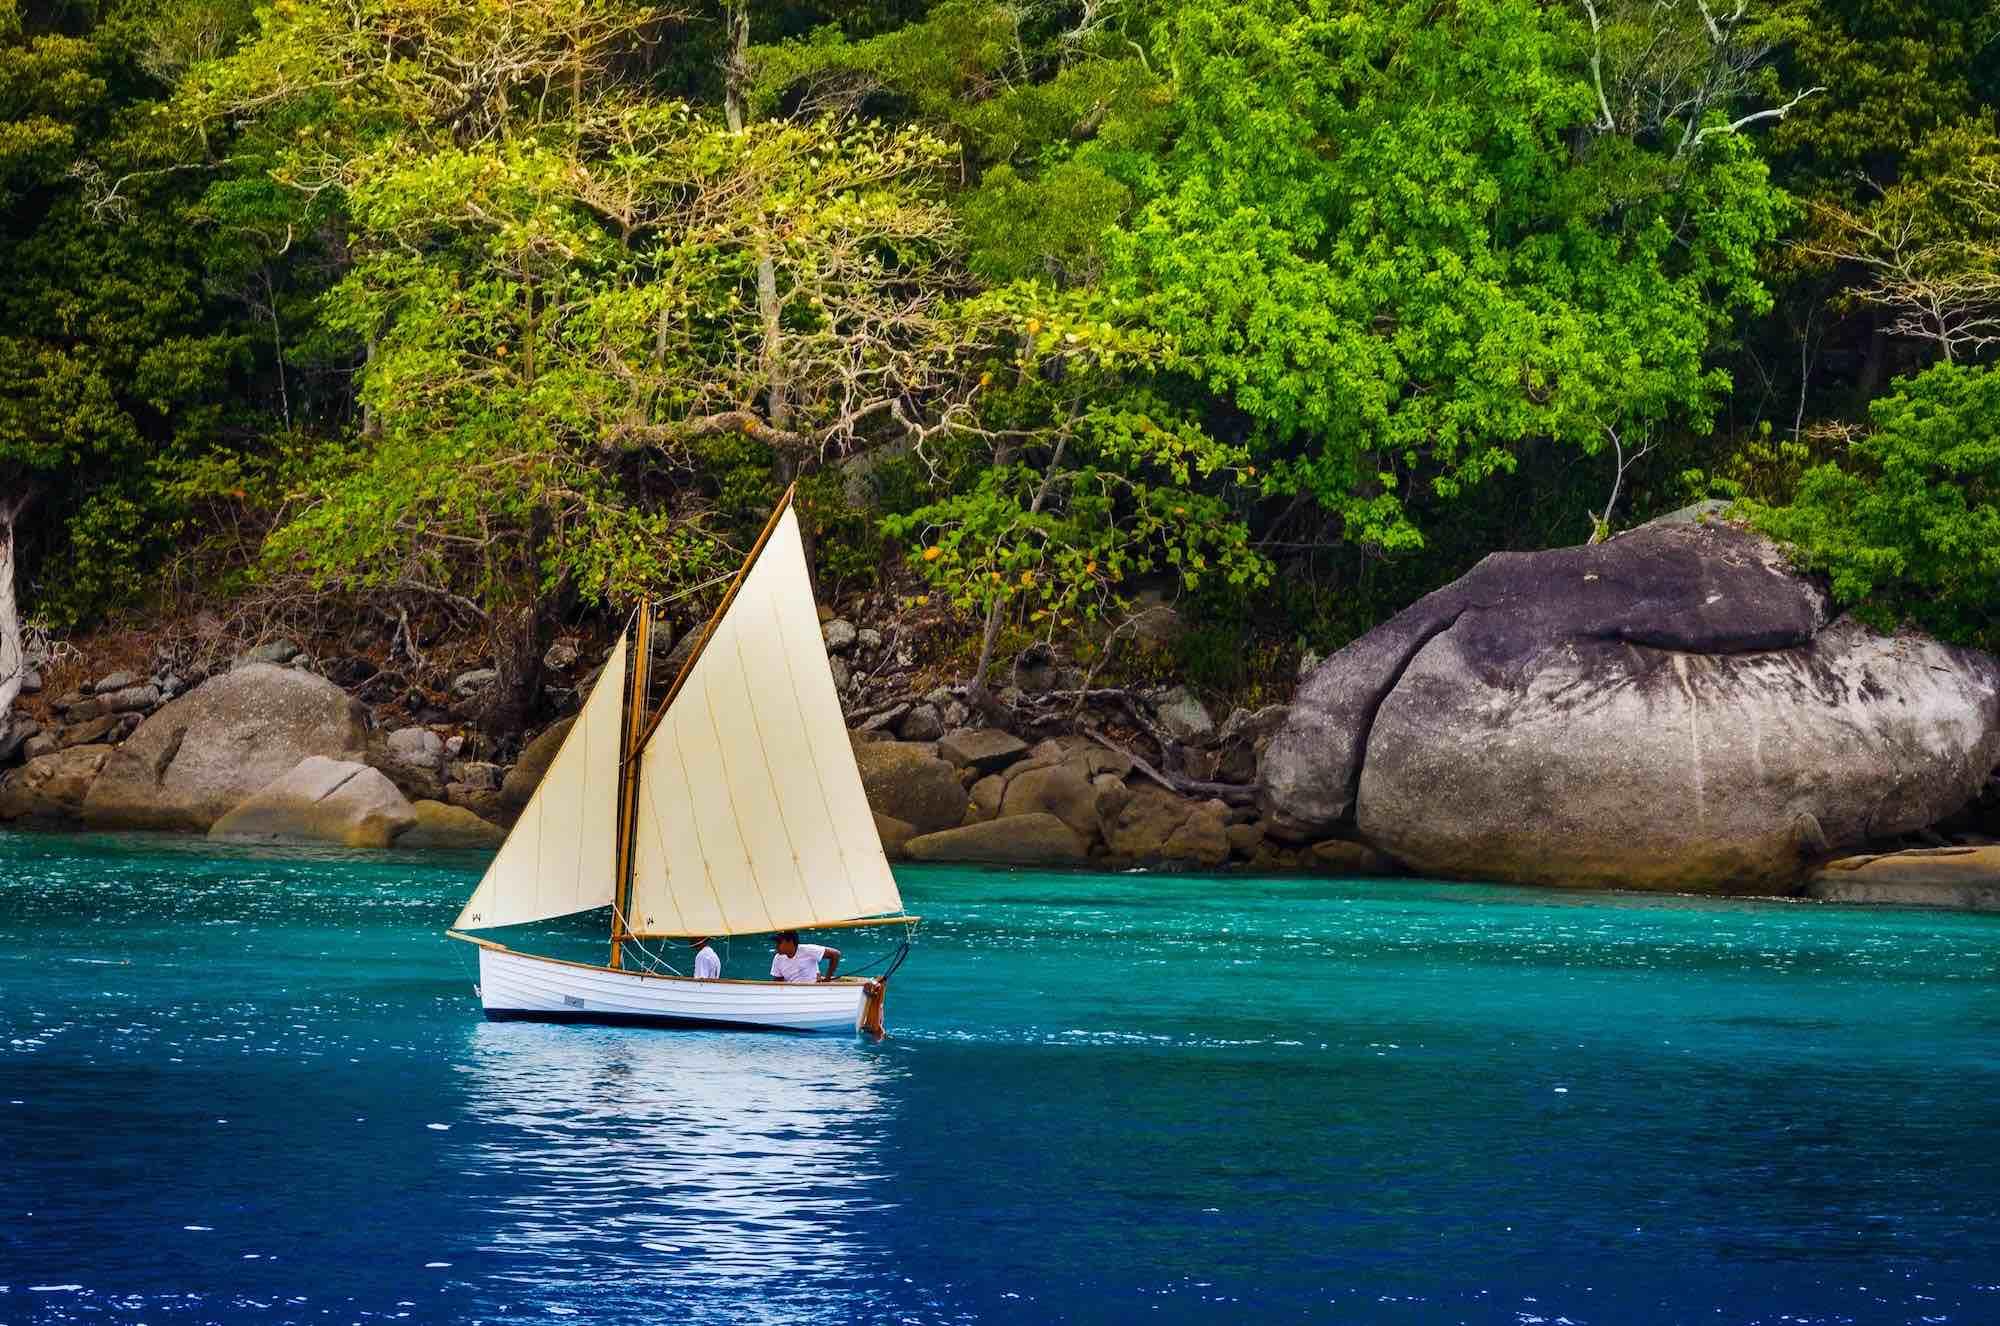 Dallinghoo_ELSA sailing holiday on emerald blue waters near lush island in Myanmar_XS.jpeg